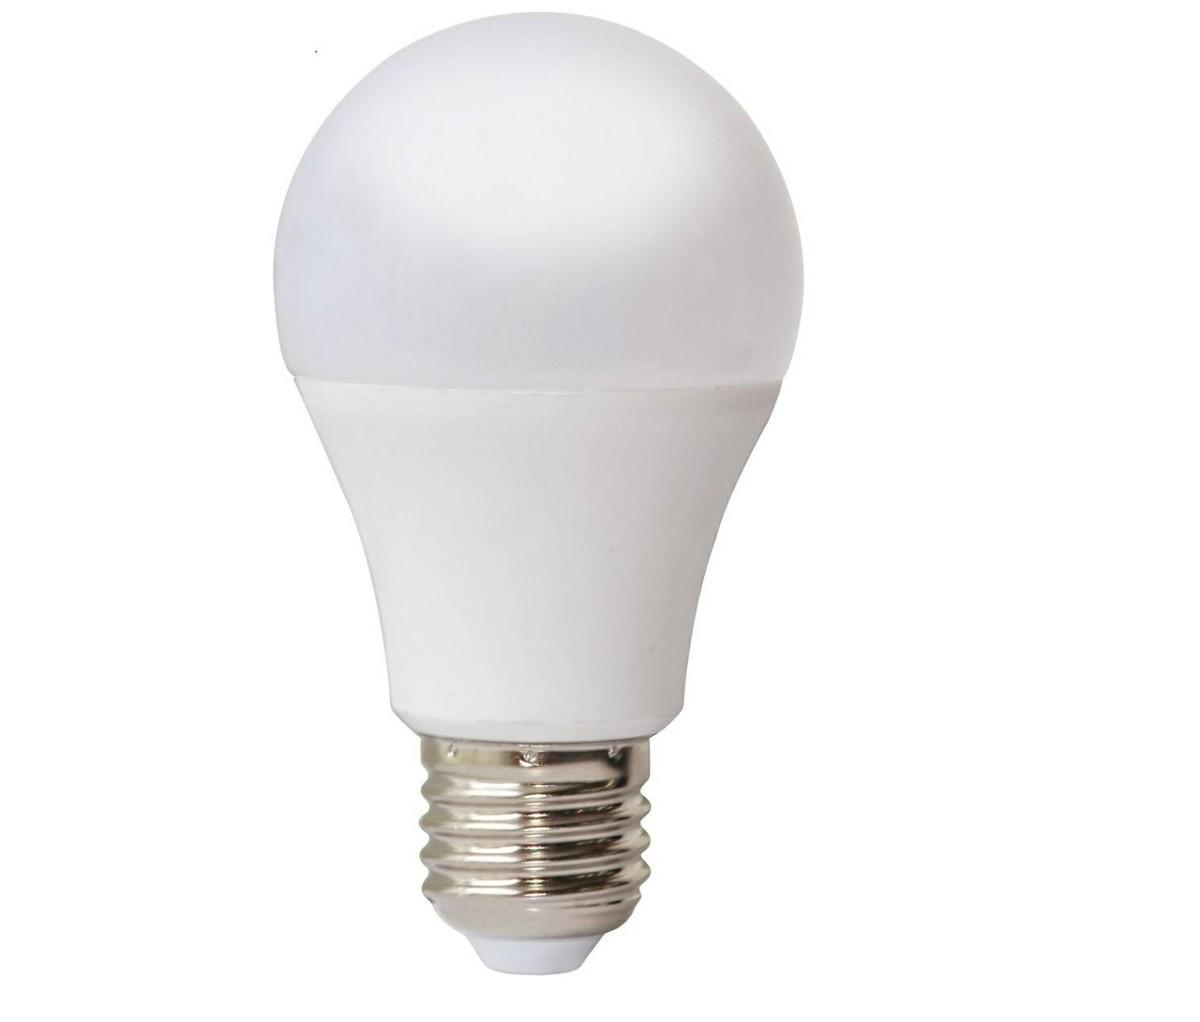 DekorStyle Žárovka LED 10W E27 - barva teplá